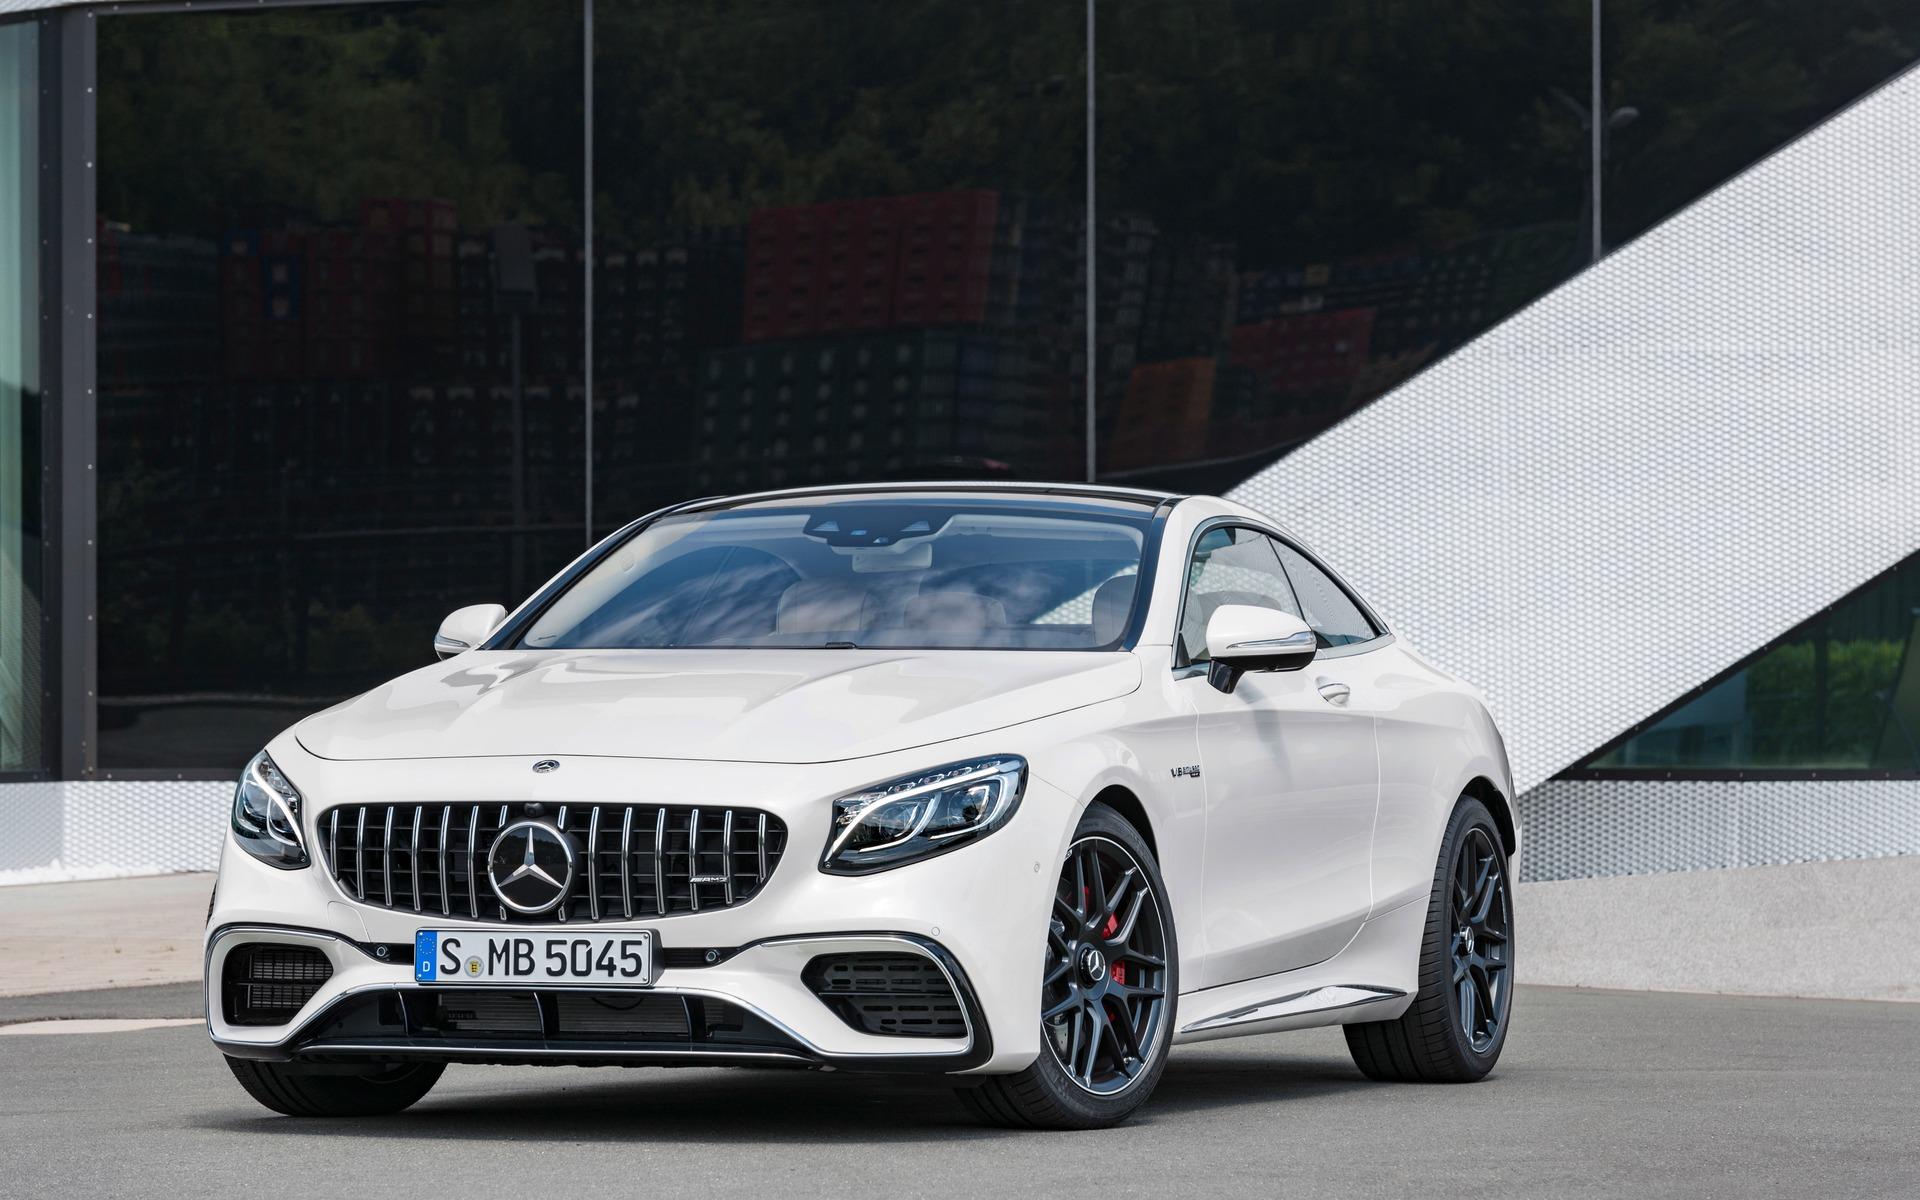 https://i.gaw.to/photos/3/0/6/306839_2018_Mercedes-Benz_S-Class.jpg